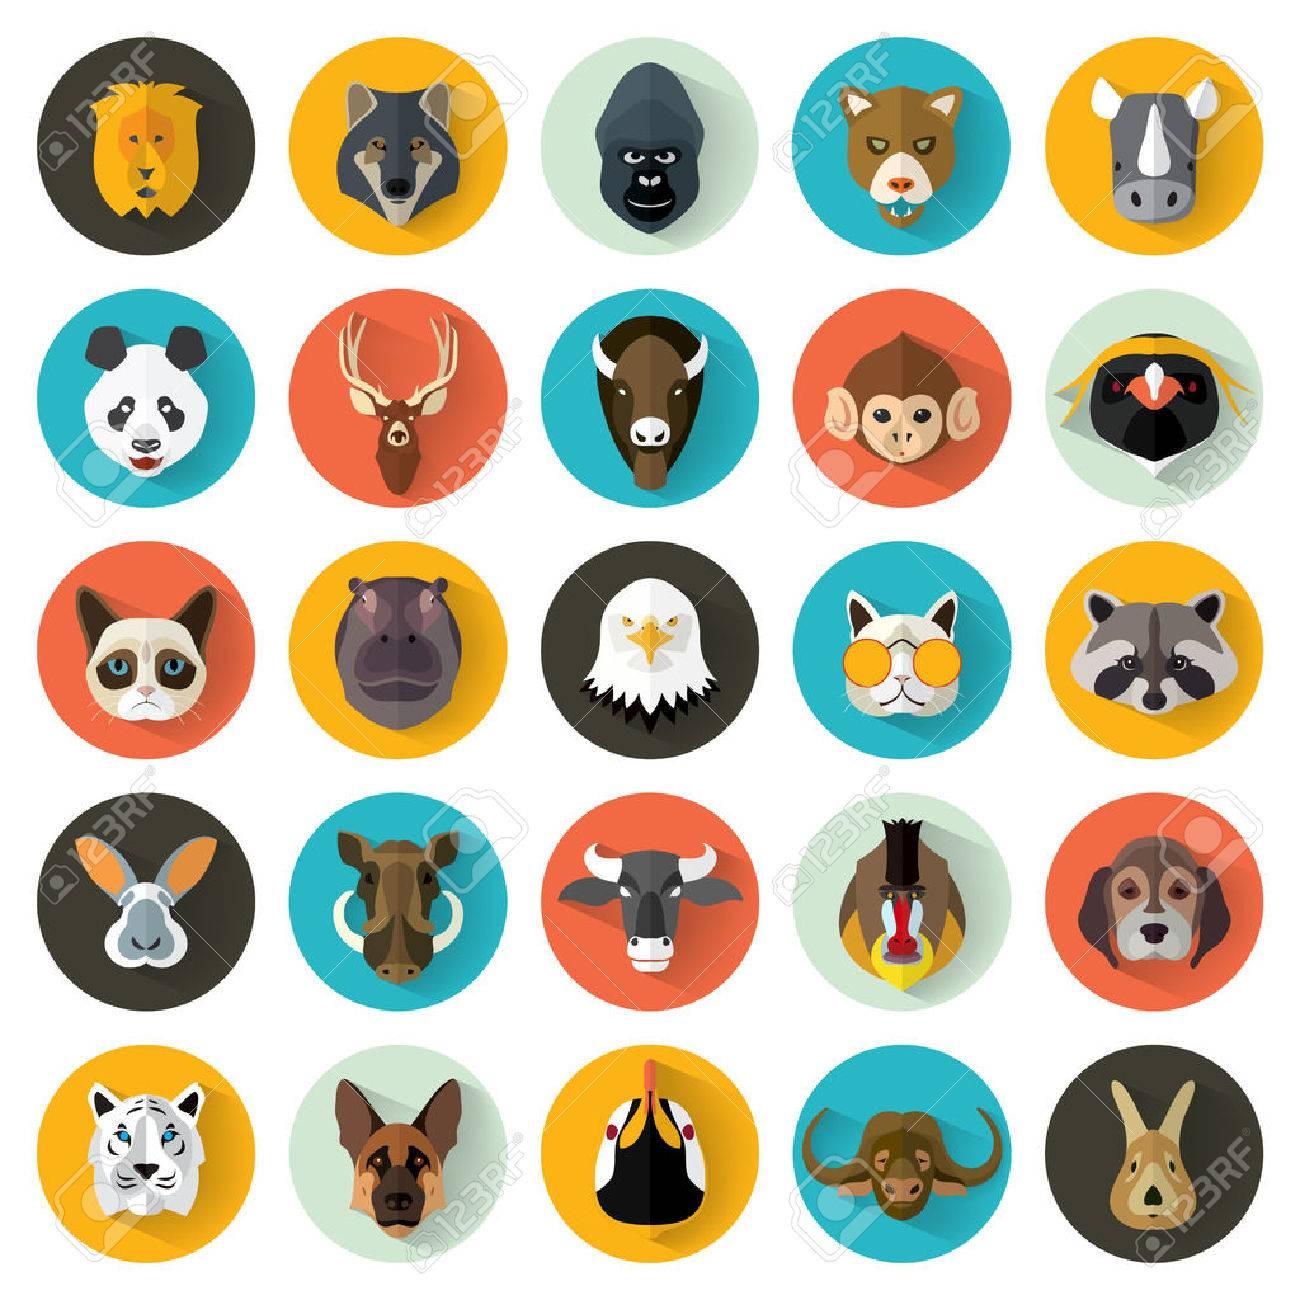 Animal Portrait Set with Flat Design / Vector Illustration - 53347420